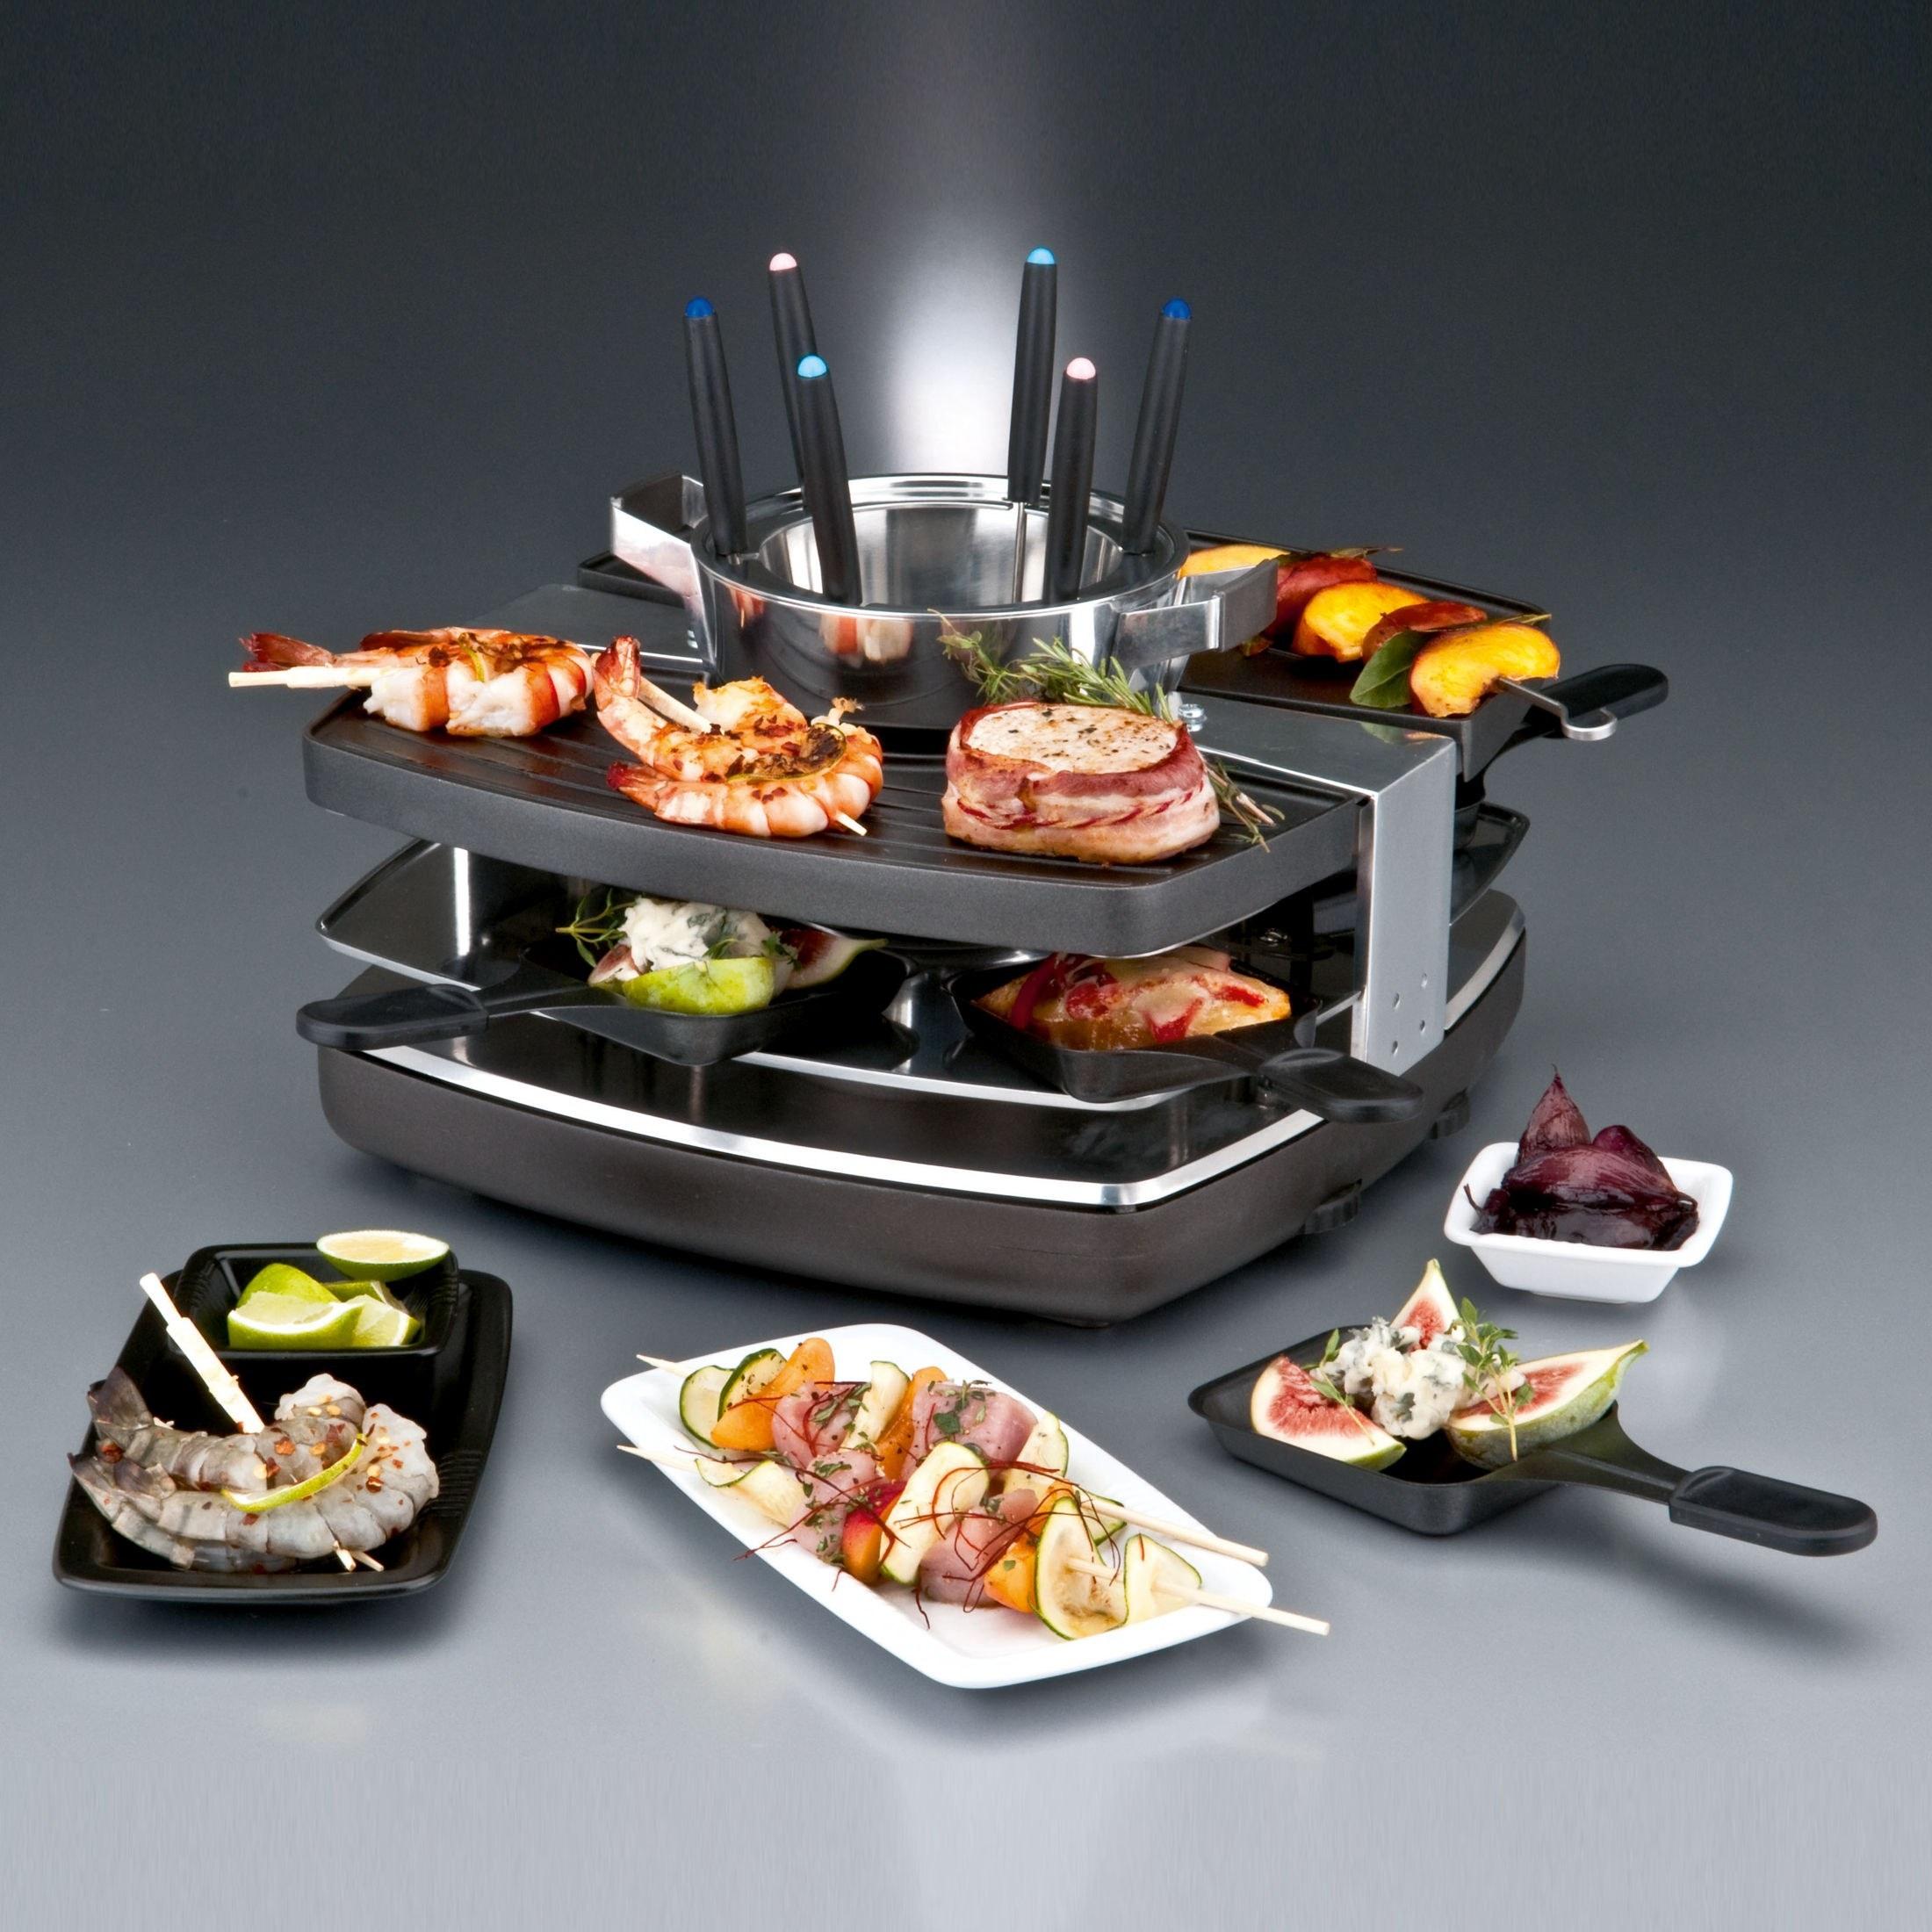 raclette fondue set duo 42559 ebay. Black Bedroom Furniture Sets. Home Design Ideas